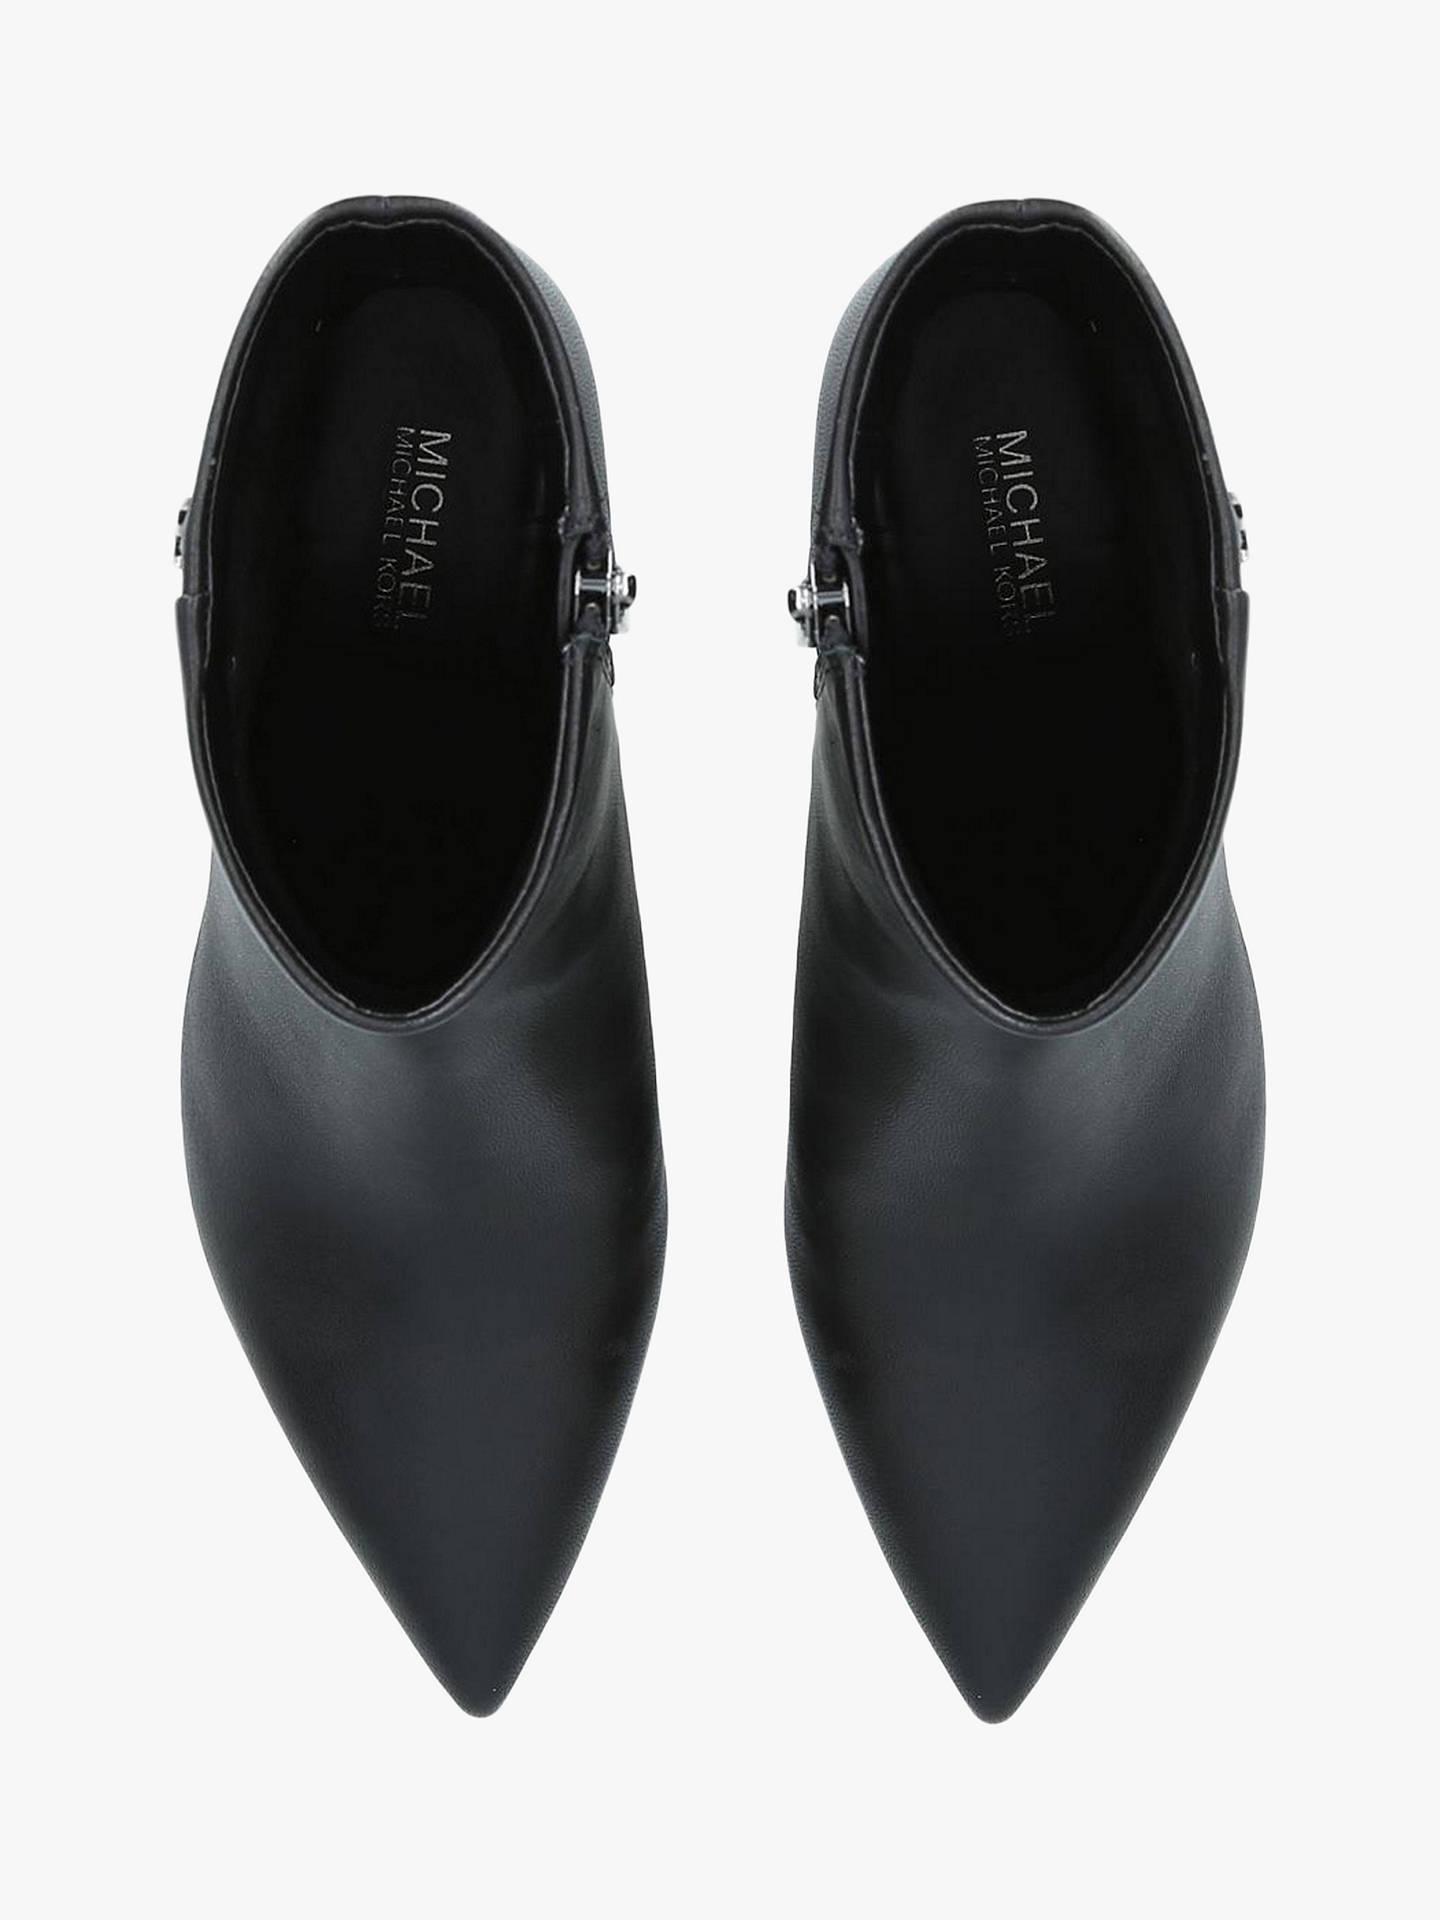 460c247fd3211 ... Buy MICHAEL Michael Kors Blaine Flex Kitten Heel Ankle Boots, Black  Leather, 7 Online